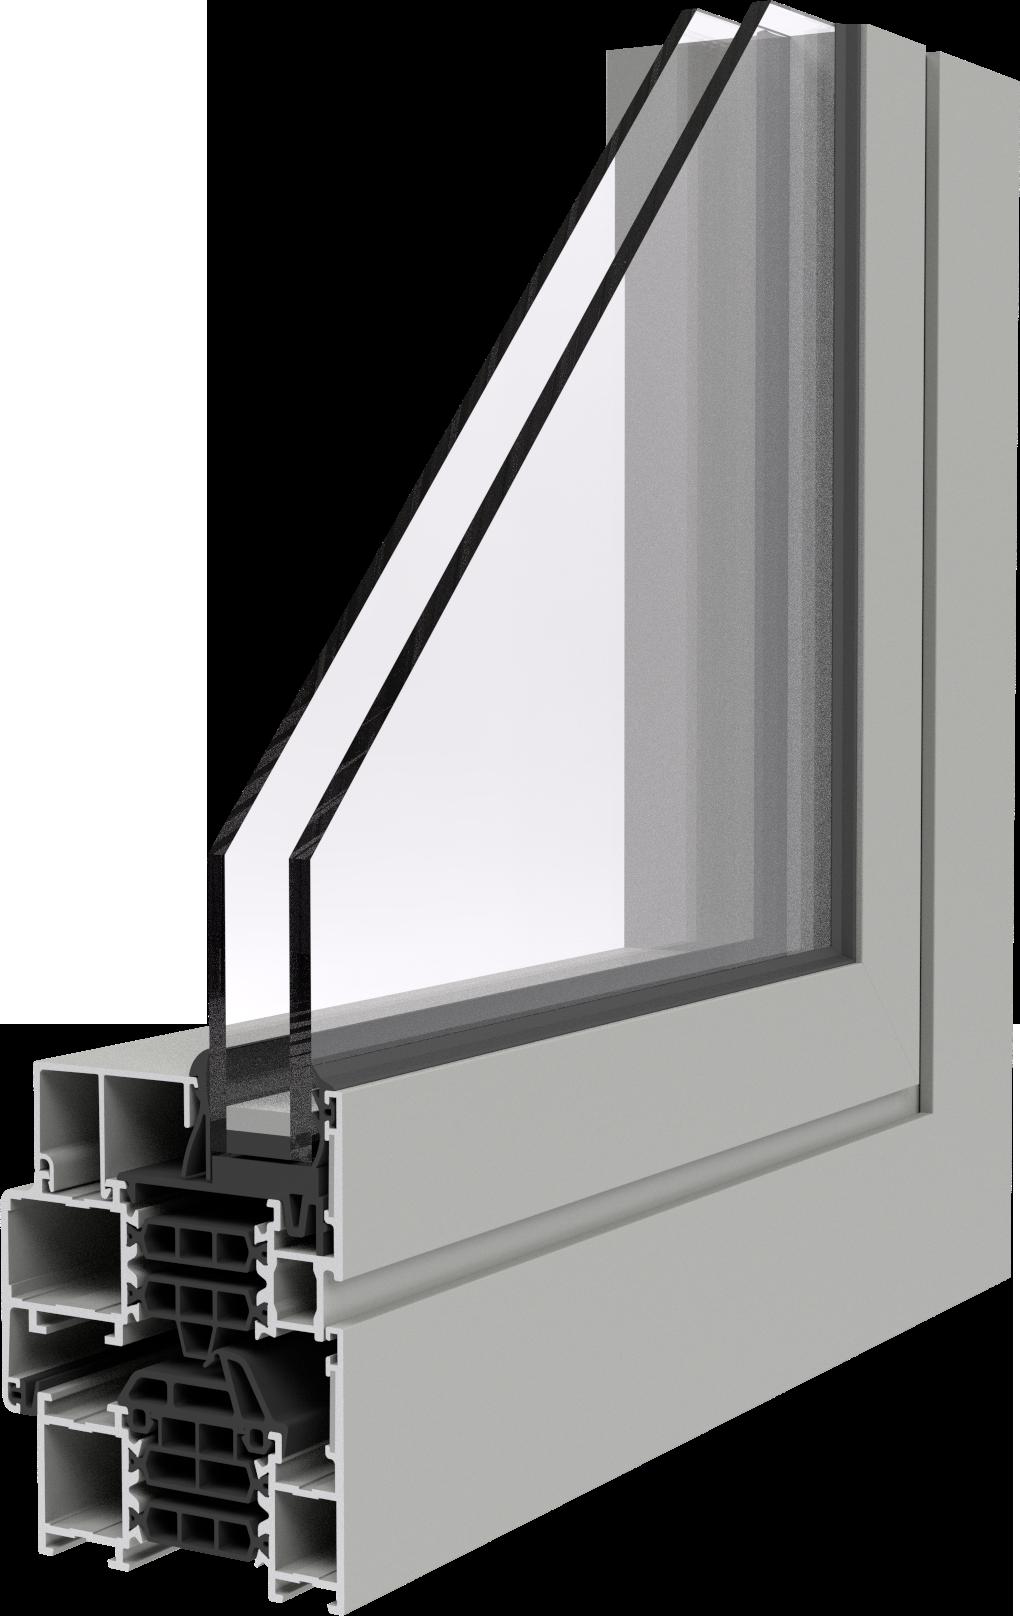 aliplast-superial-okno